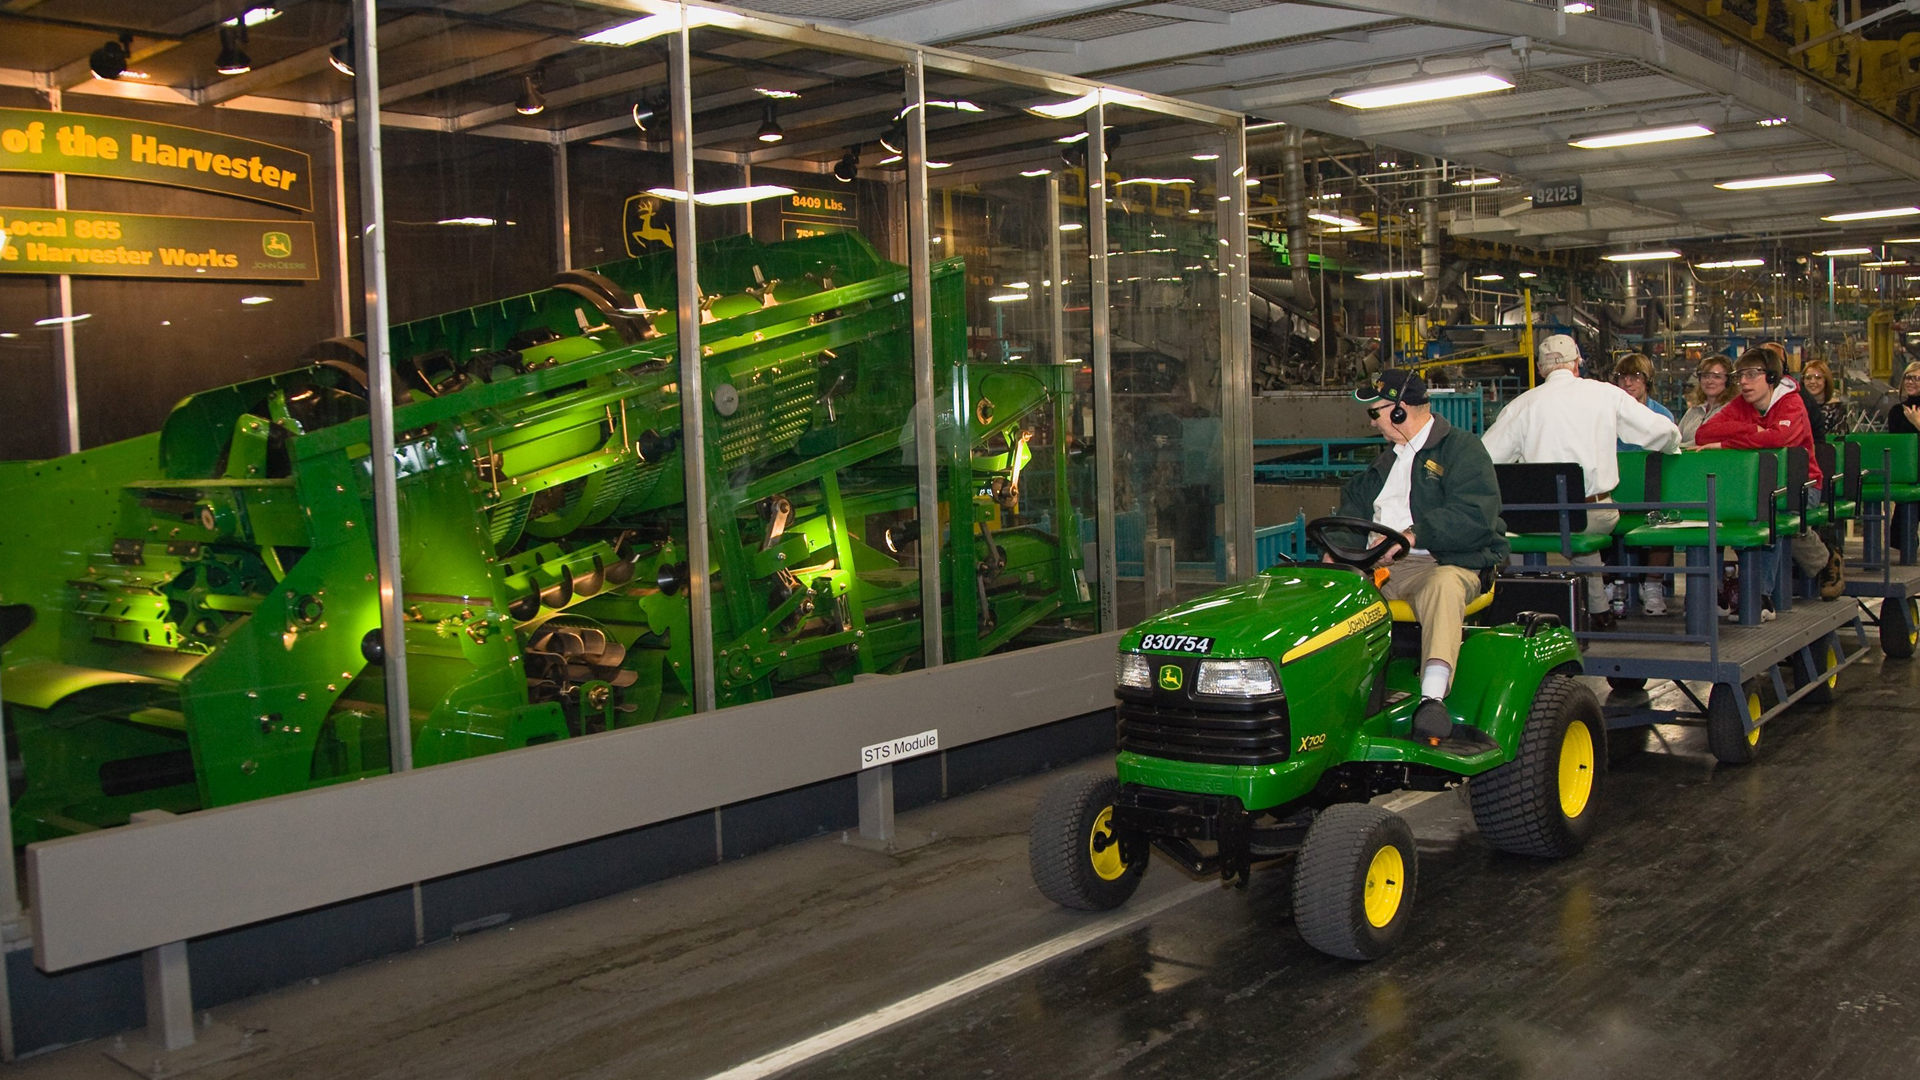 John Deere Harvester Works Combine Factory Tours Enjoy